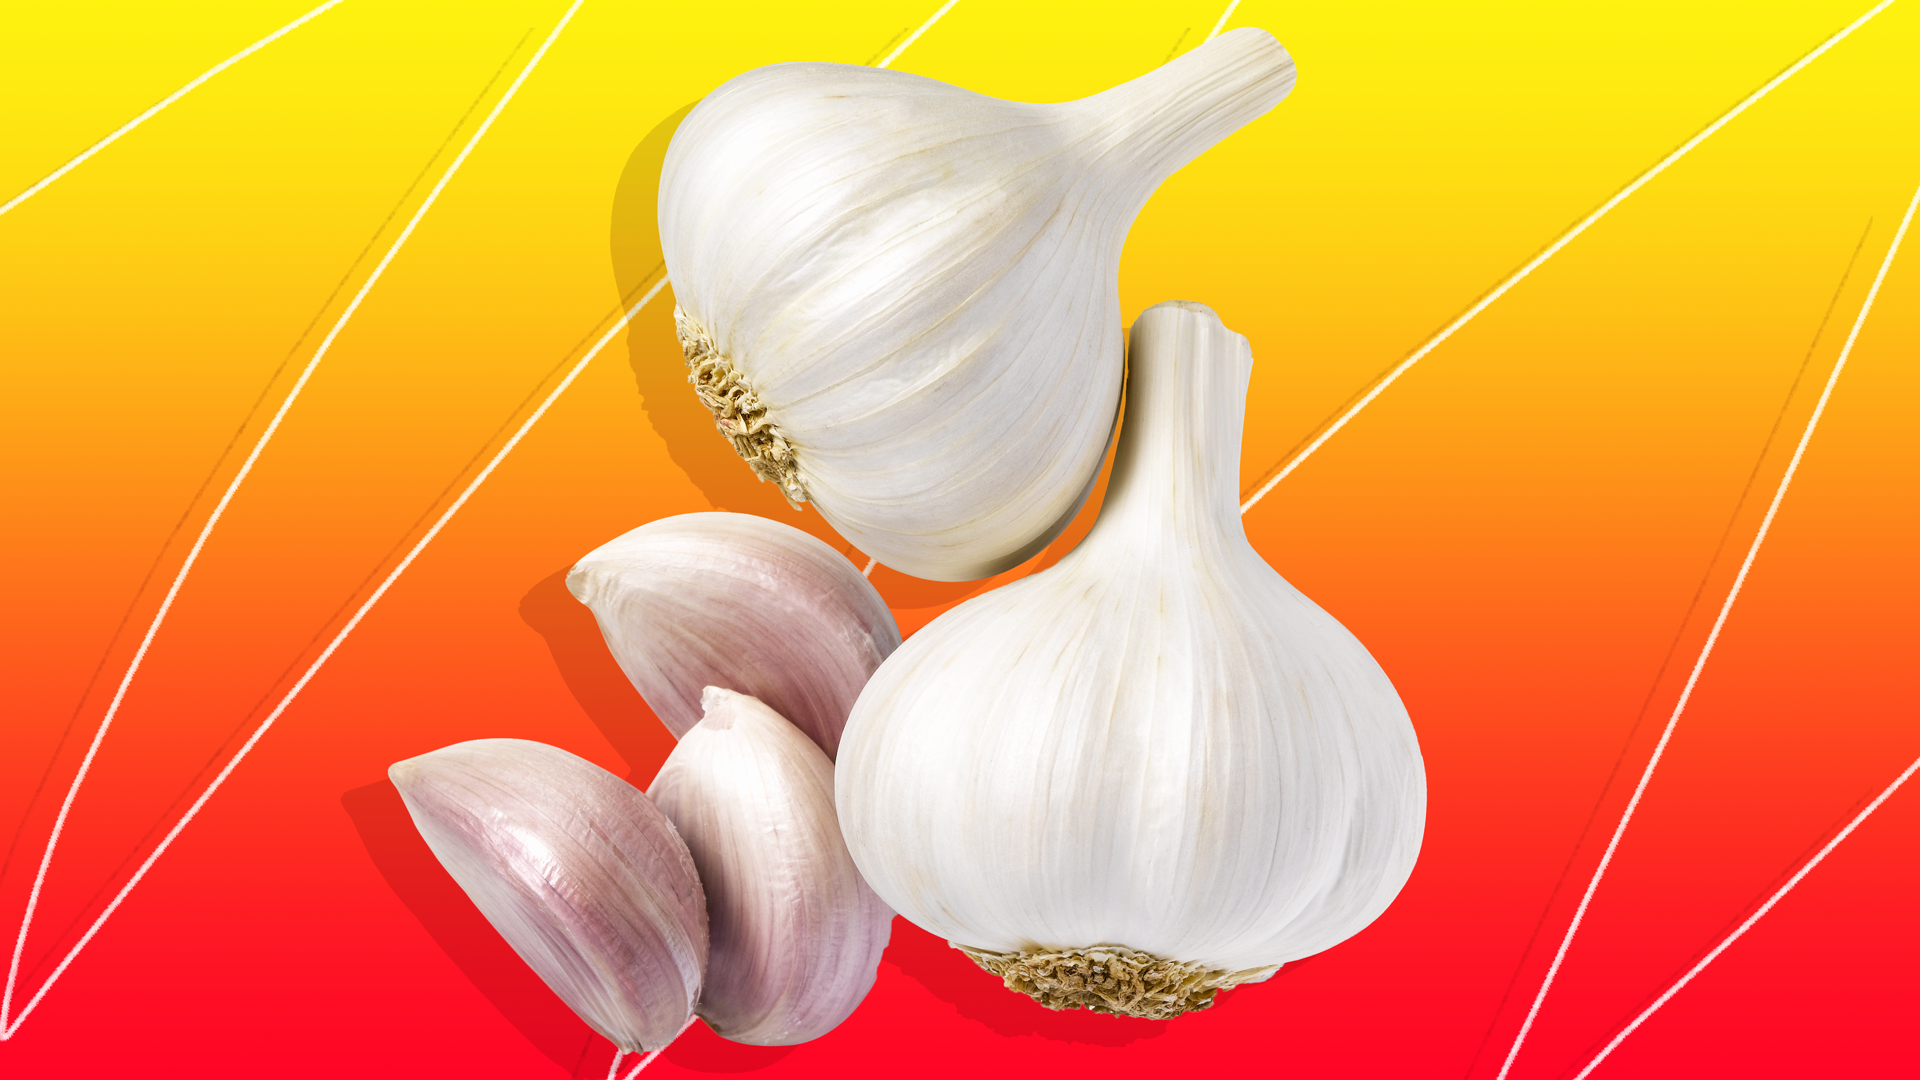 garlic under your pillow